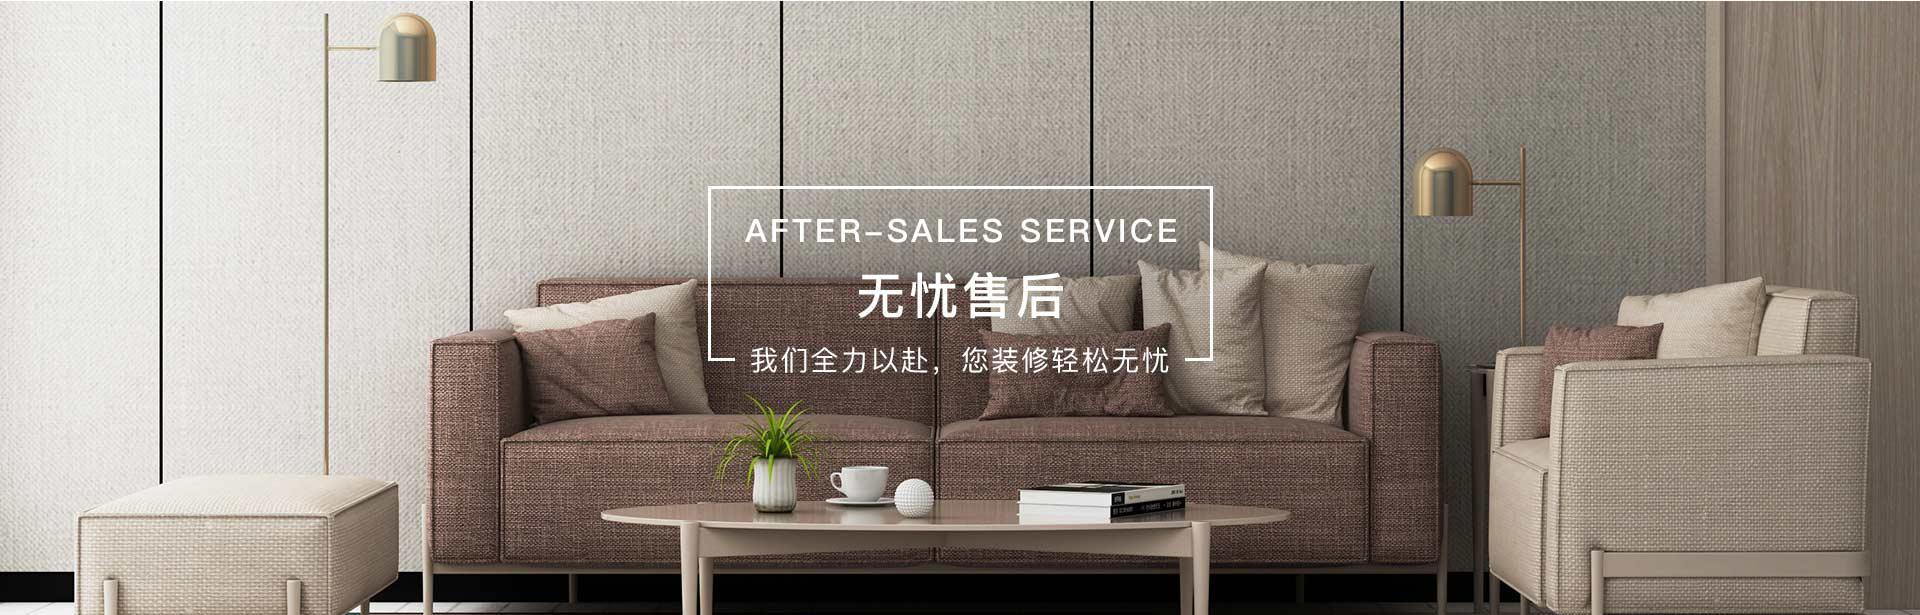 banner service